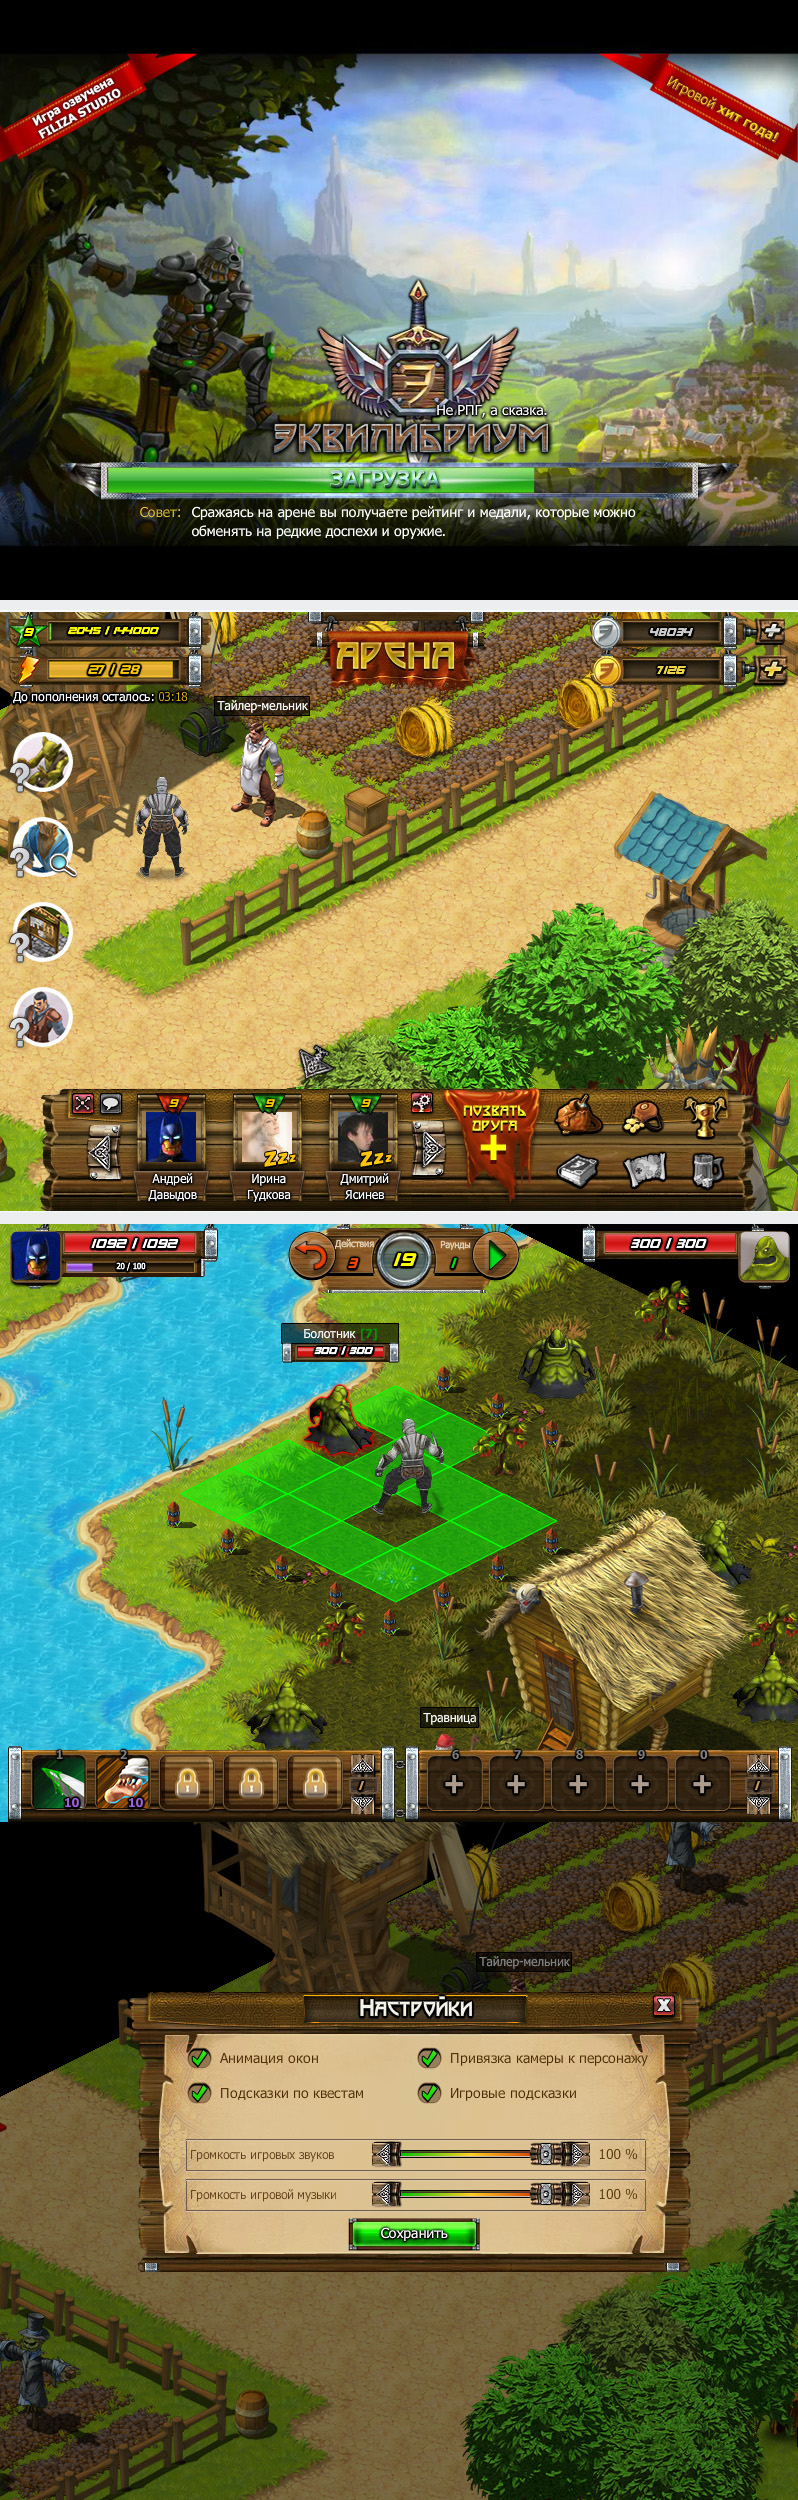 Онлайн-игра Эквилибриум